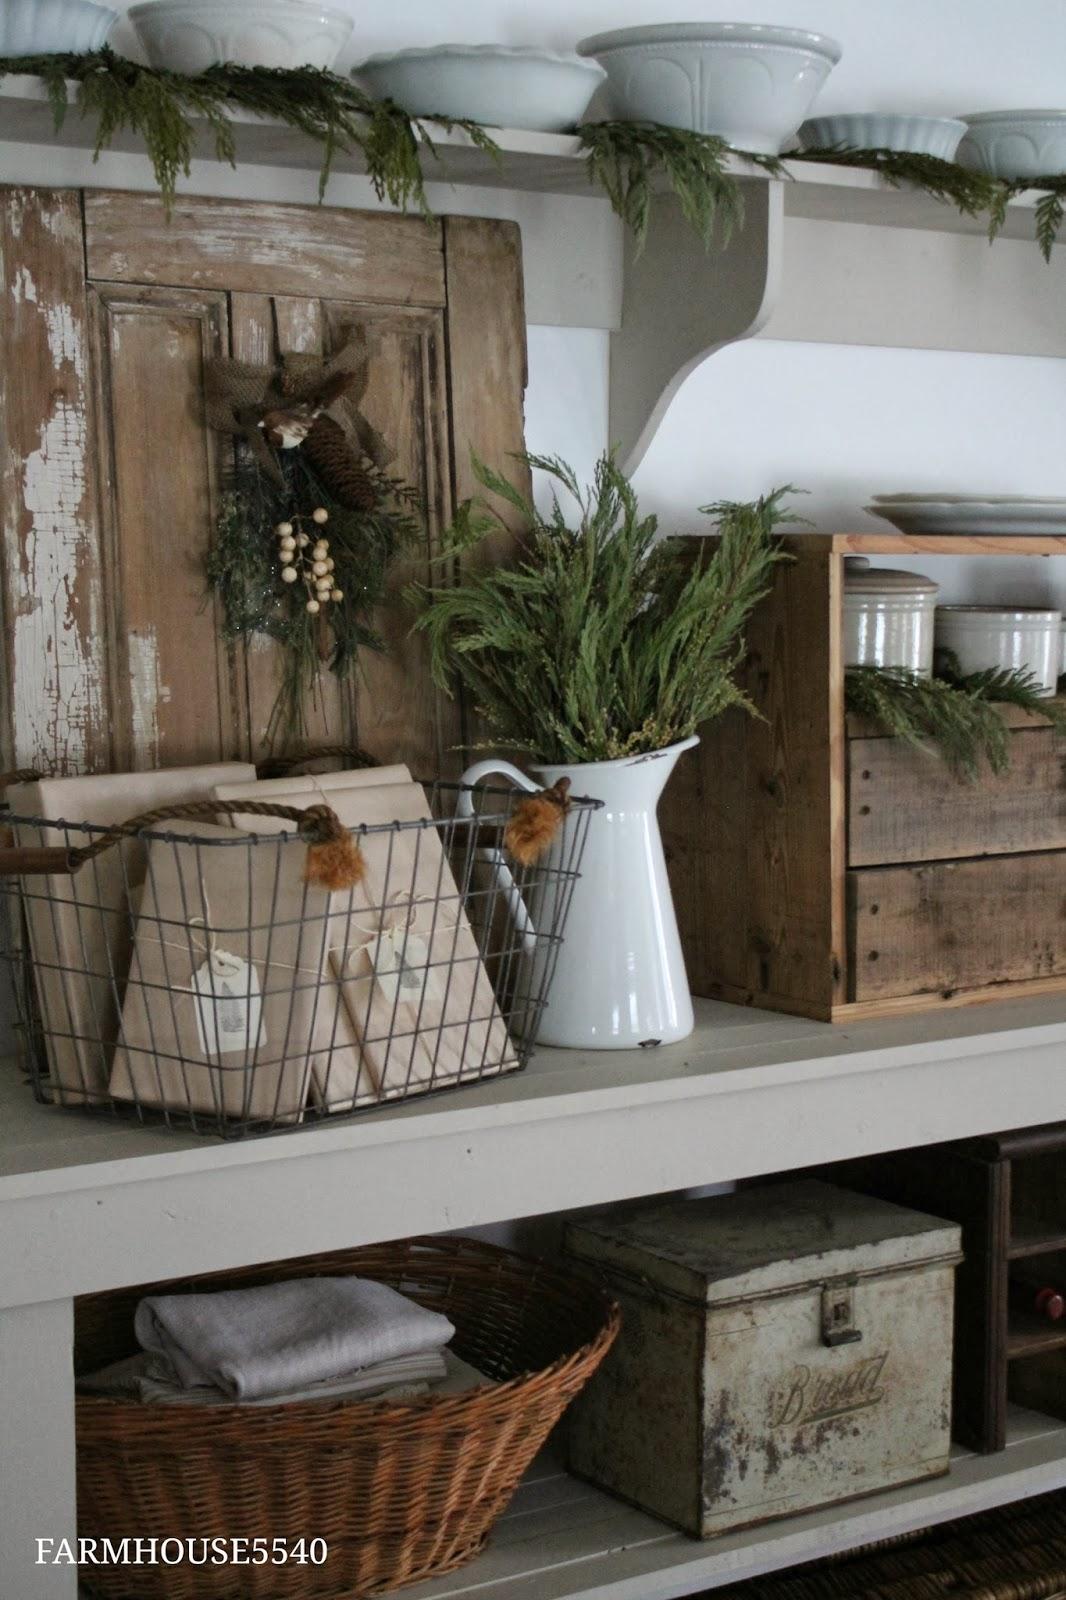 Farmhouse Decor For Living Rooms: FARMHOUSE 5540: Farmhouse Christmas Part 3